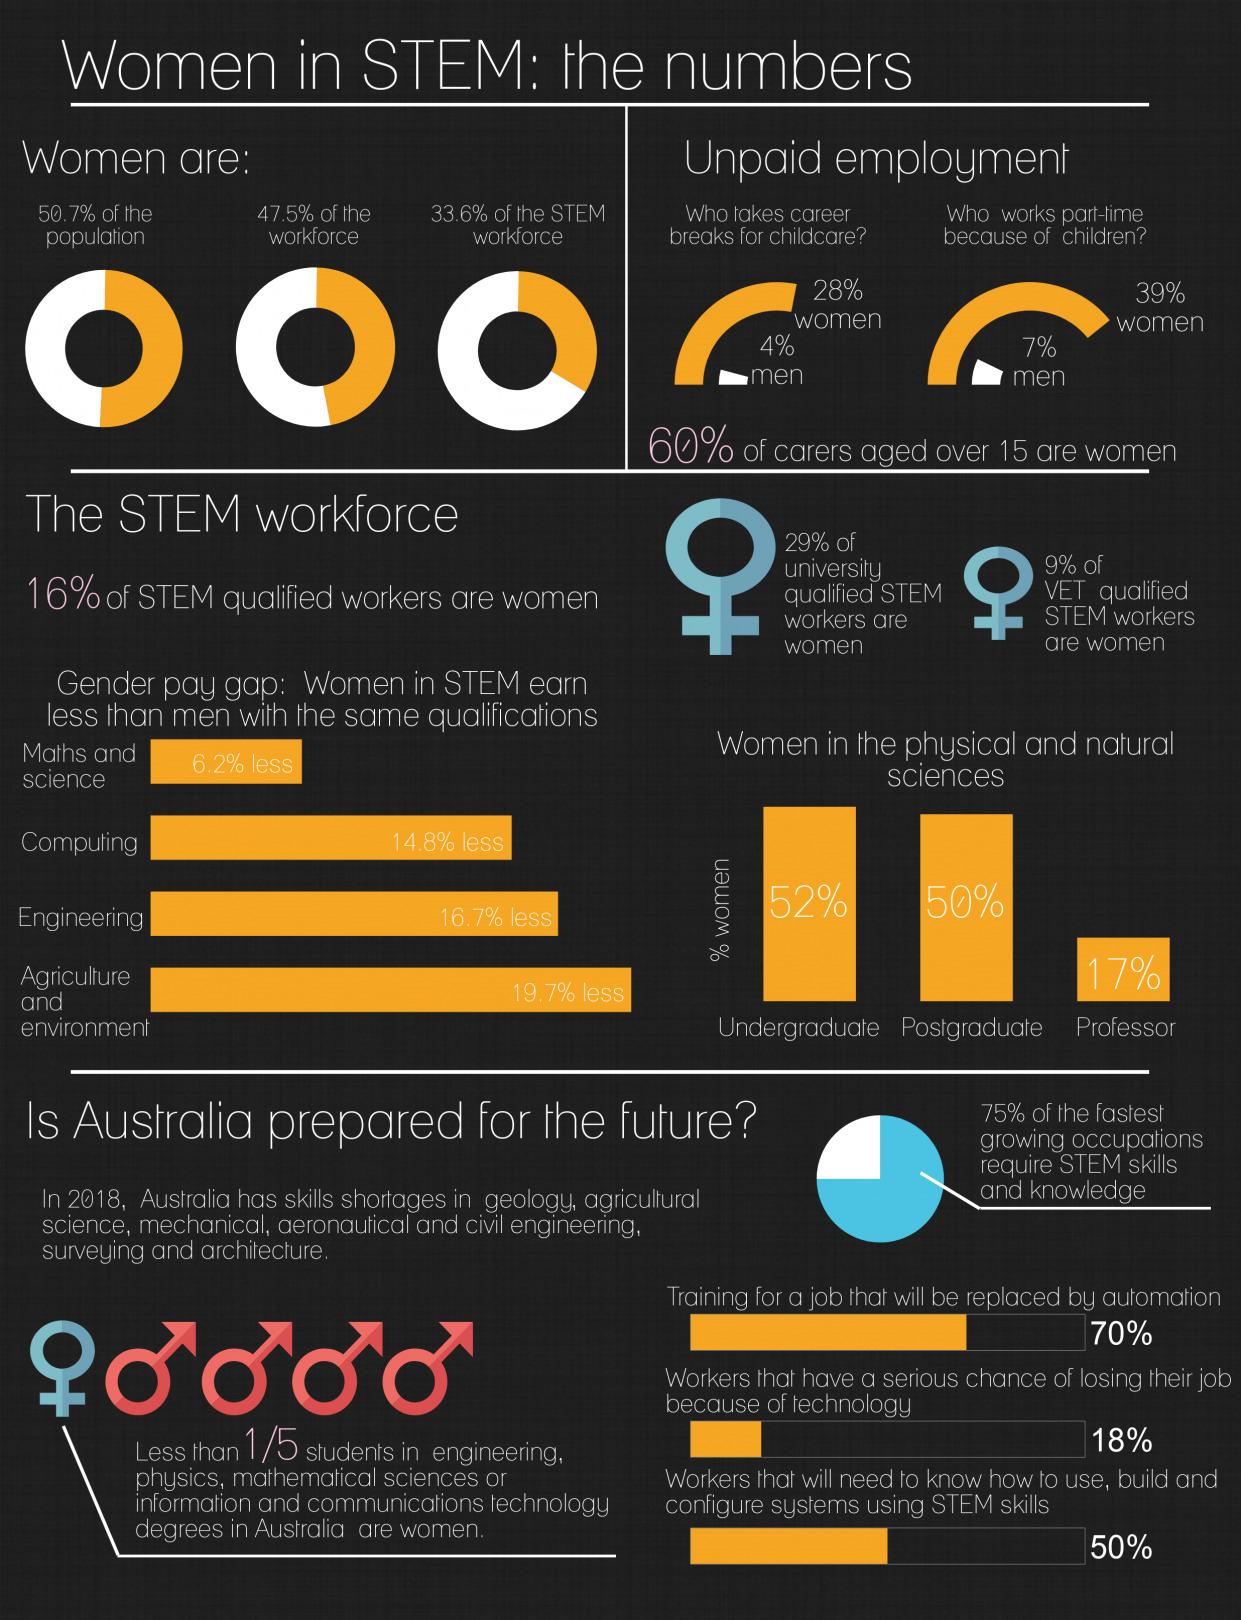 women-in-stem-infographic-1241x1620